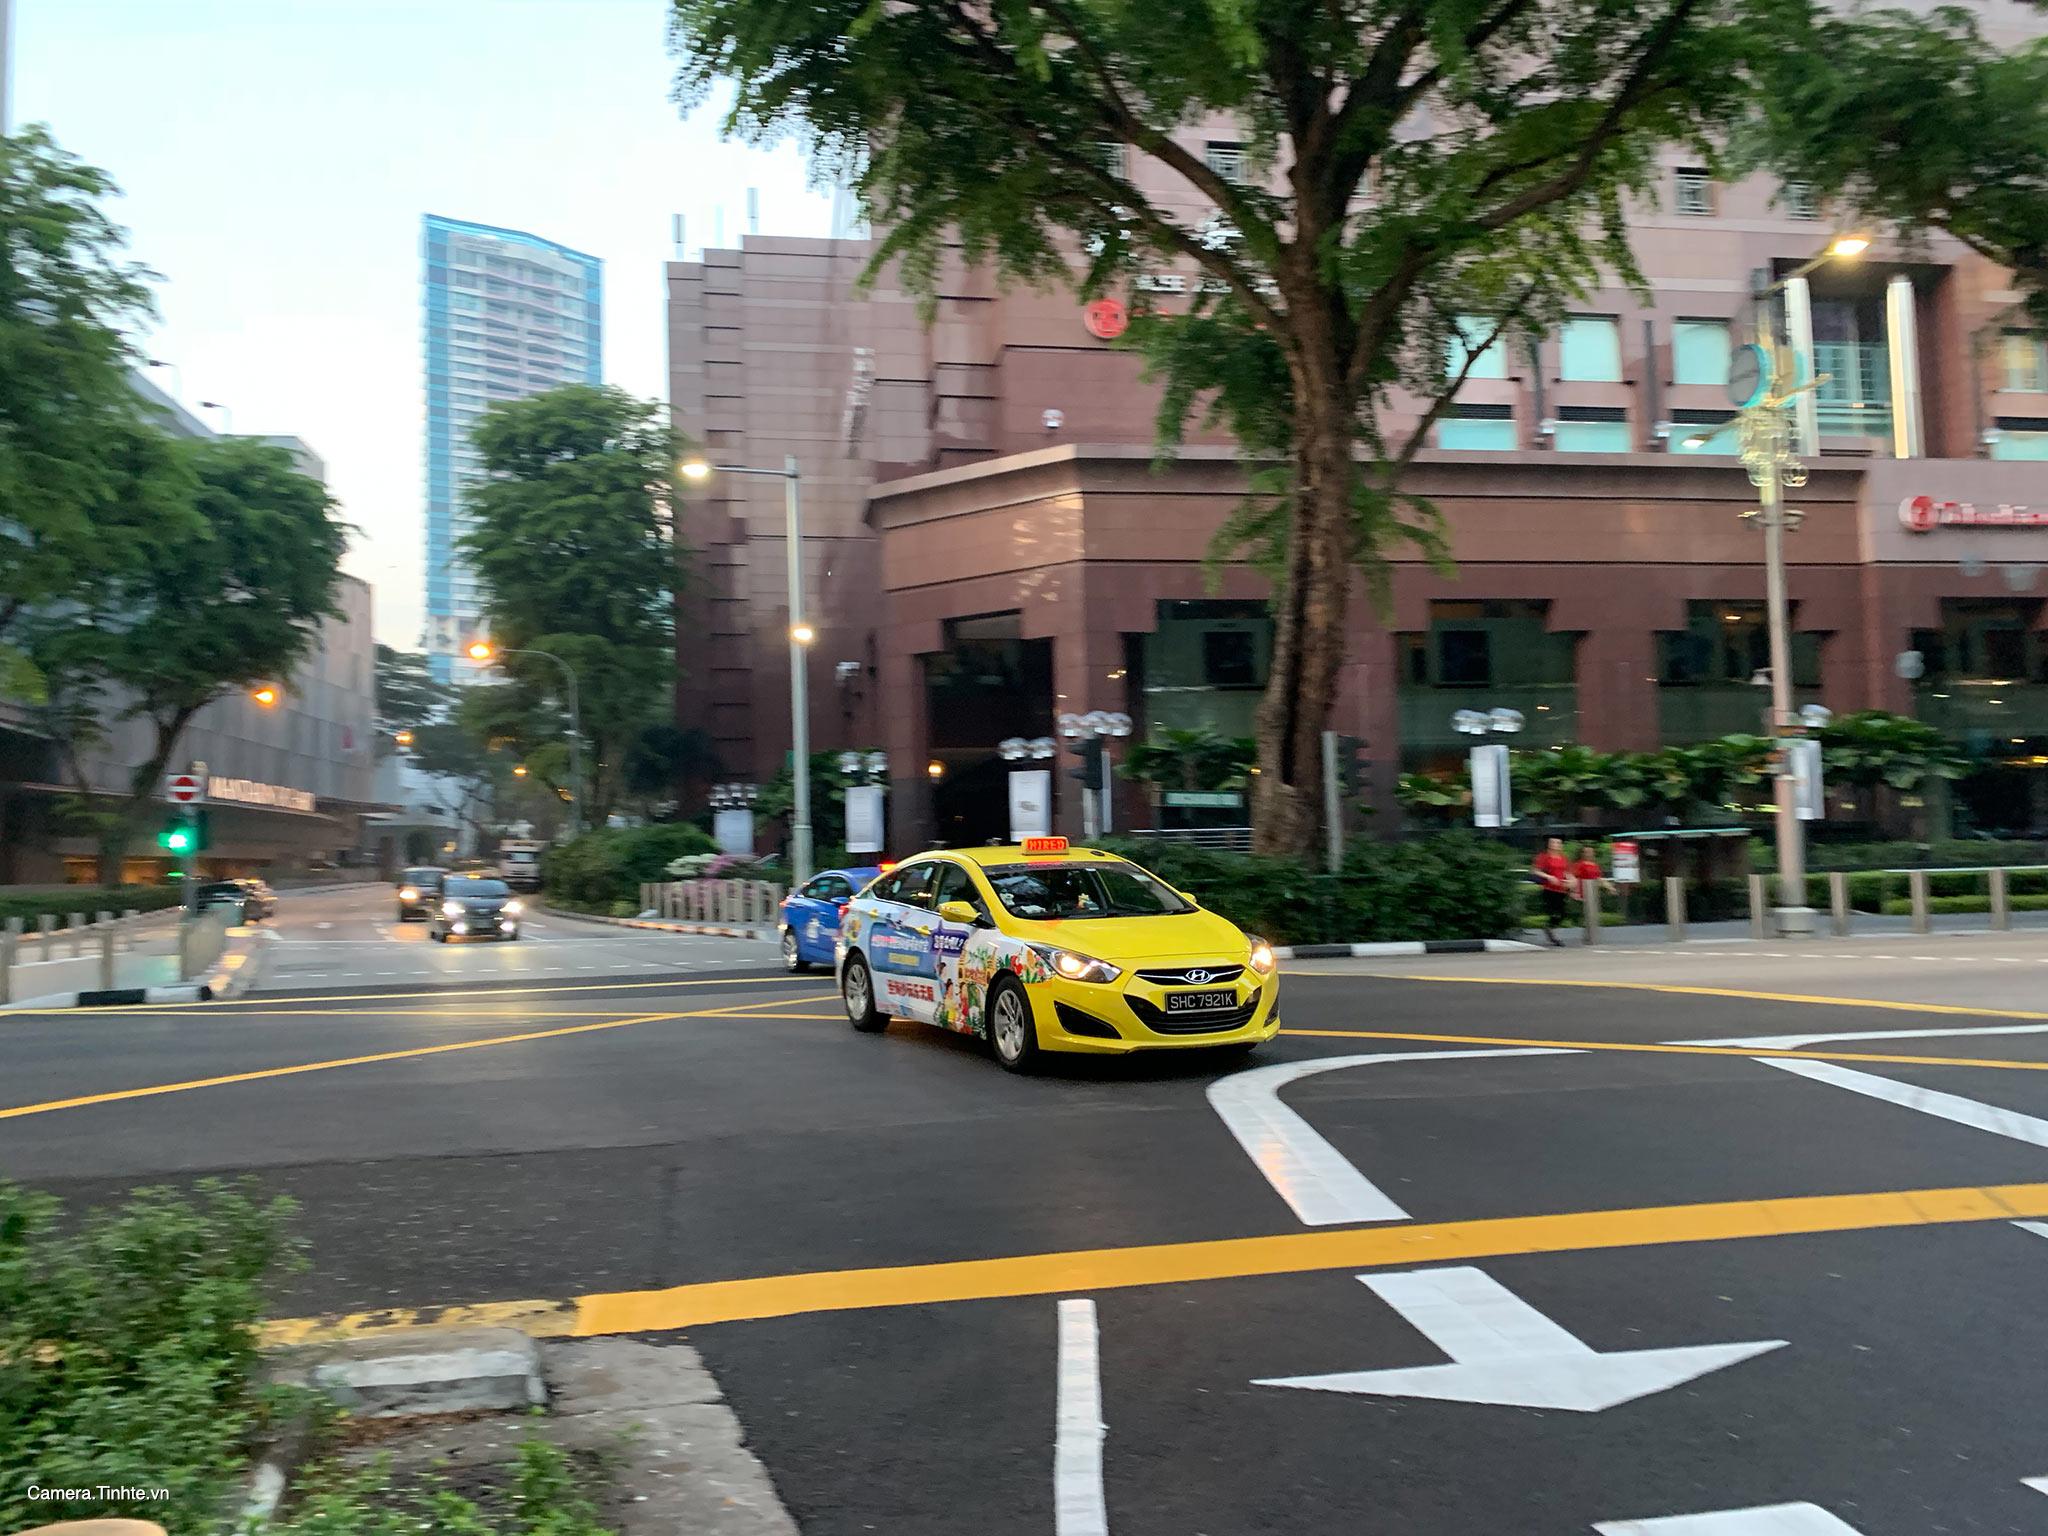 CameraTinhTe_hinh-chup-thu-iPhone-Xr_IMG_0191.jpg